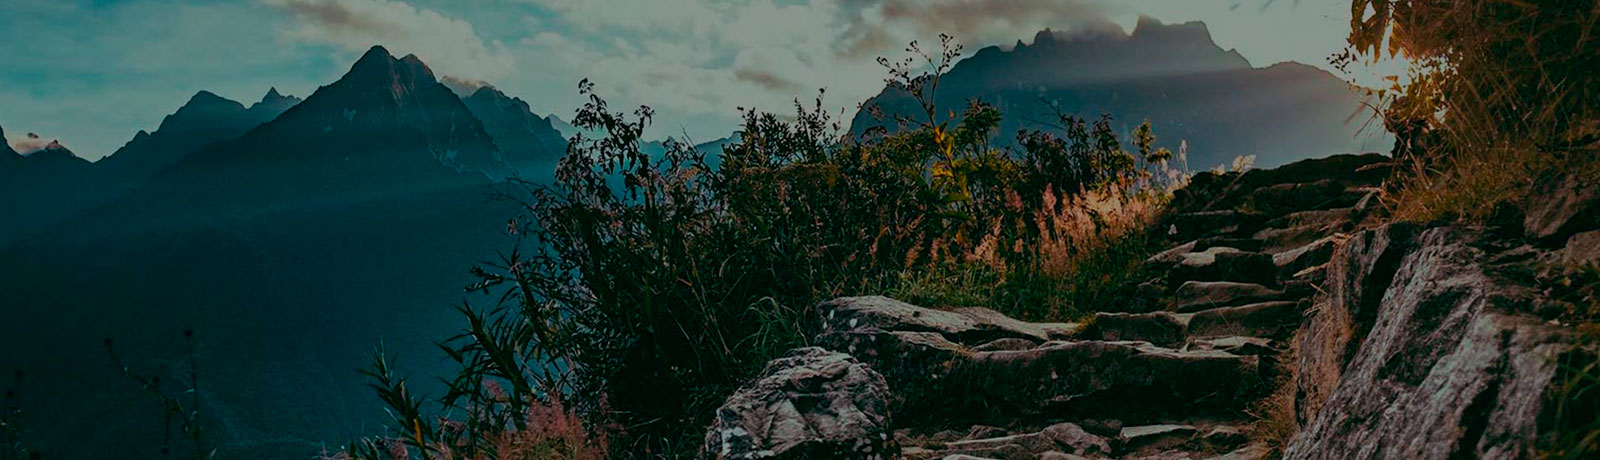 inca-trail-trek-to-machu-picchu-tour